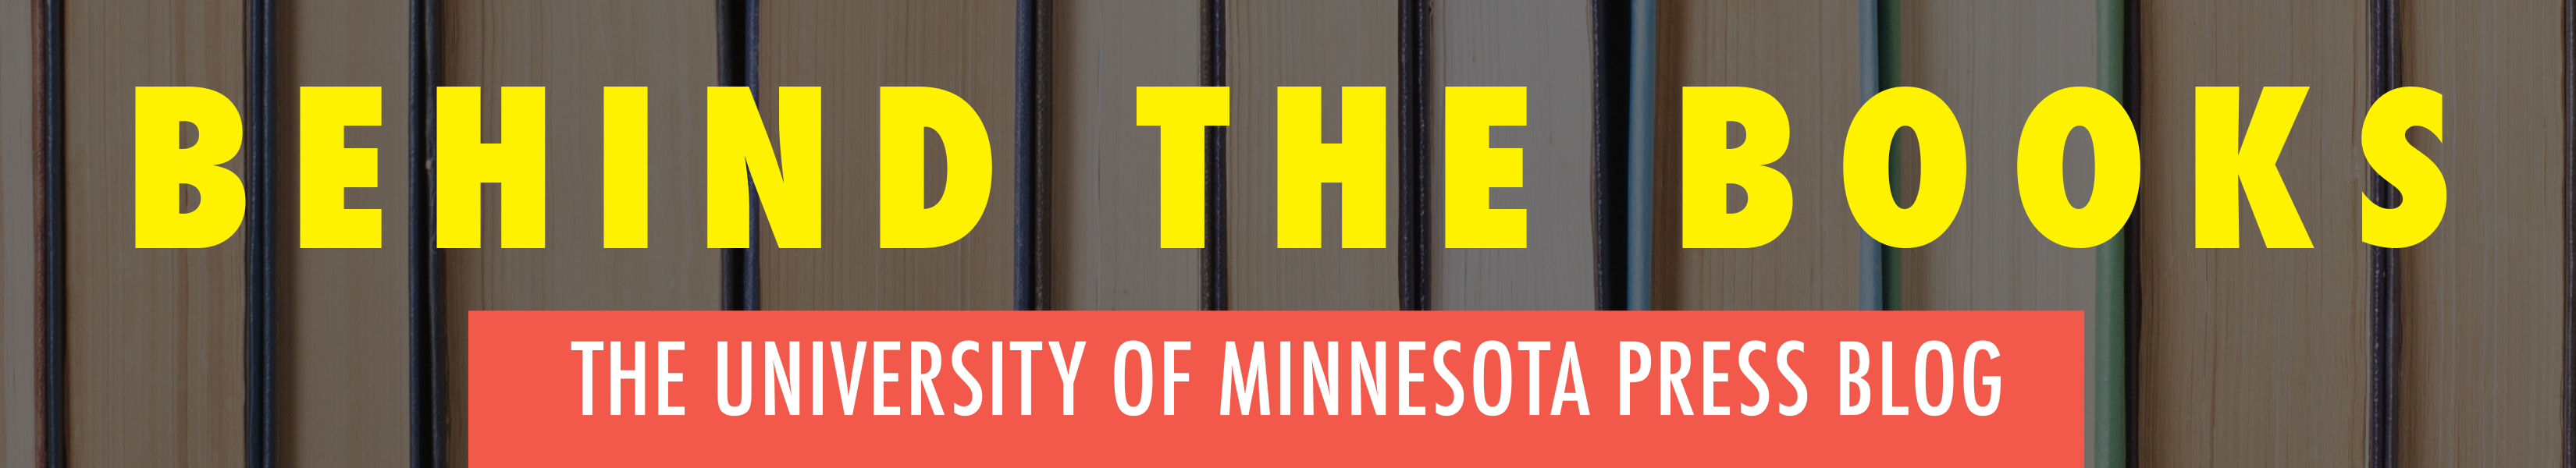 The University of Minnesota Press Blog